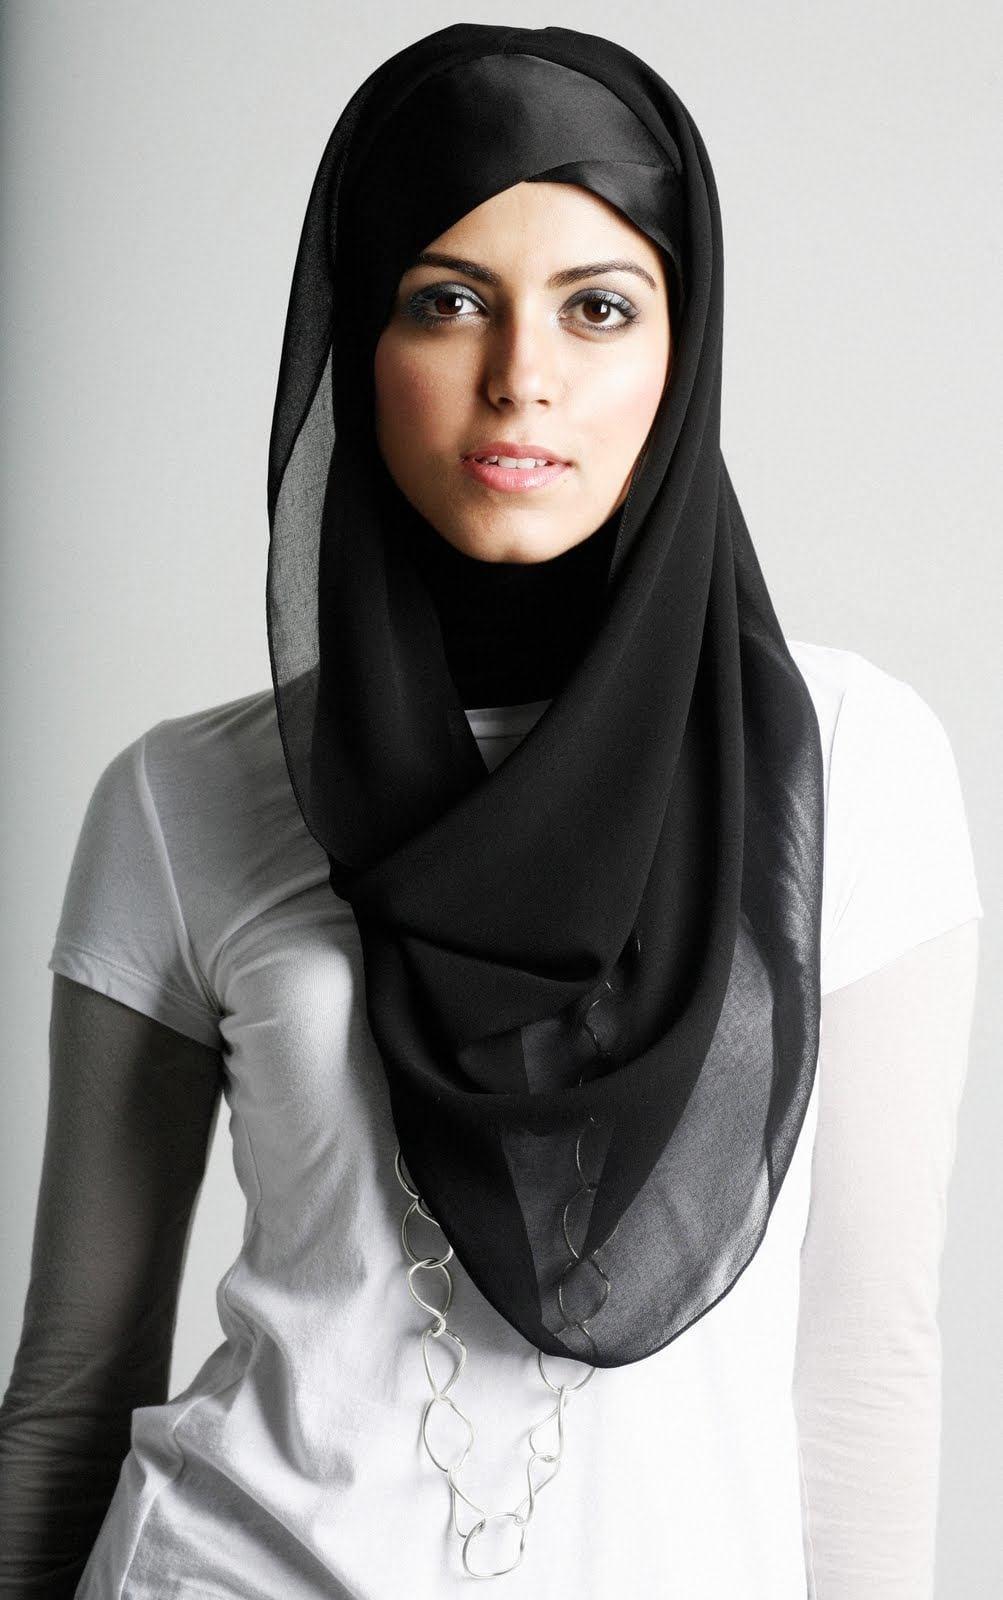 new-hijab-styles-2011-550 15 Latest Hijab Styles to Follow These Days